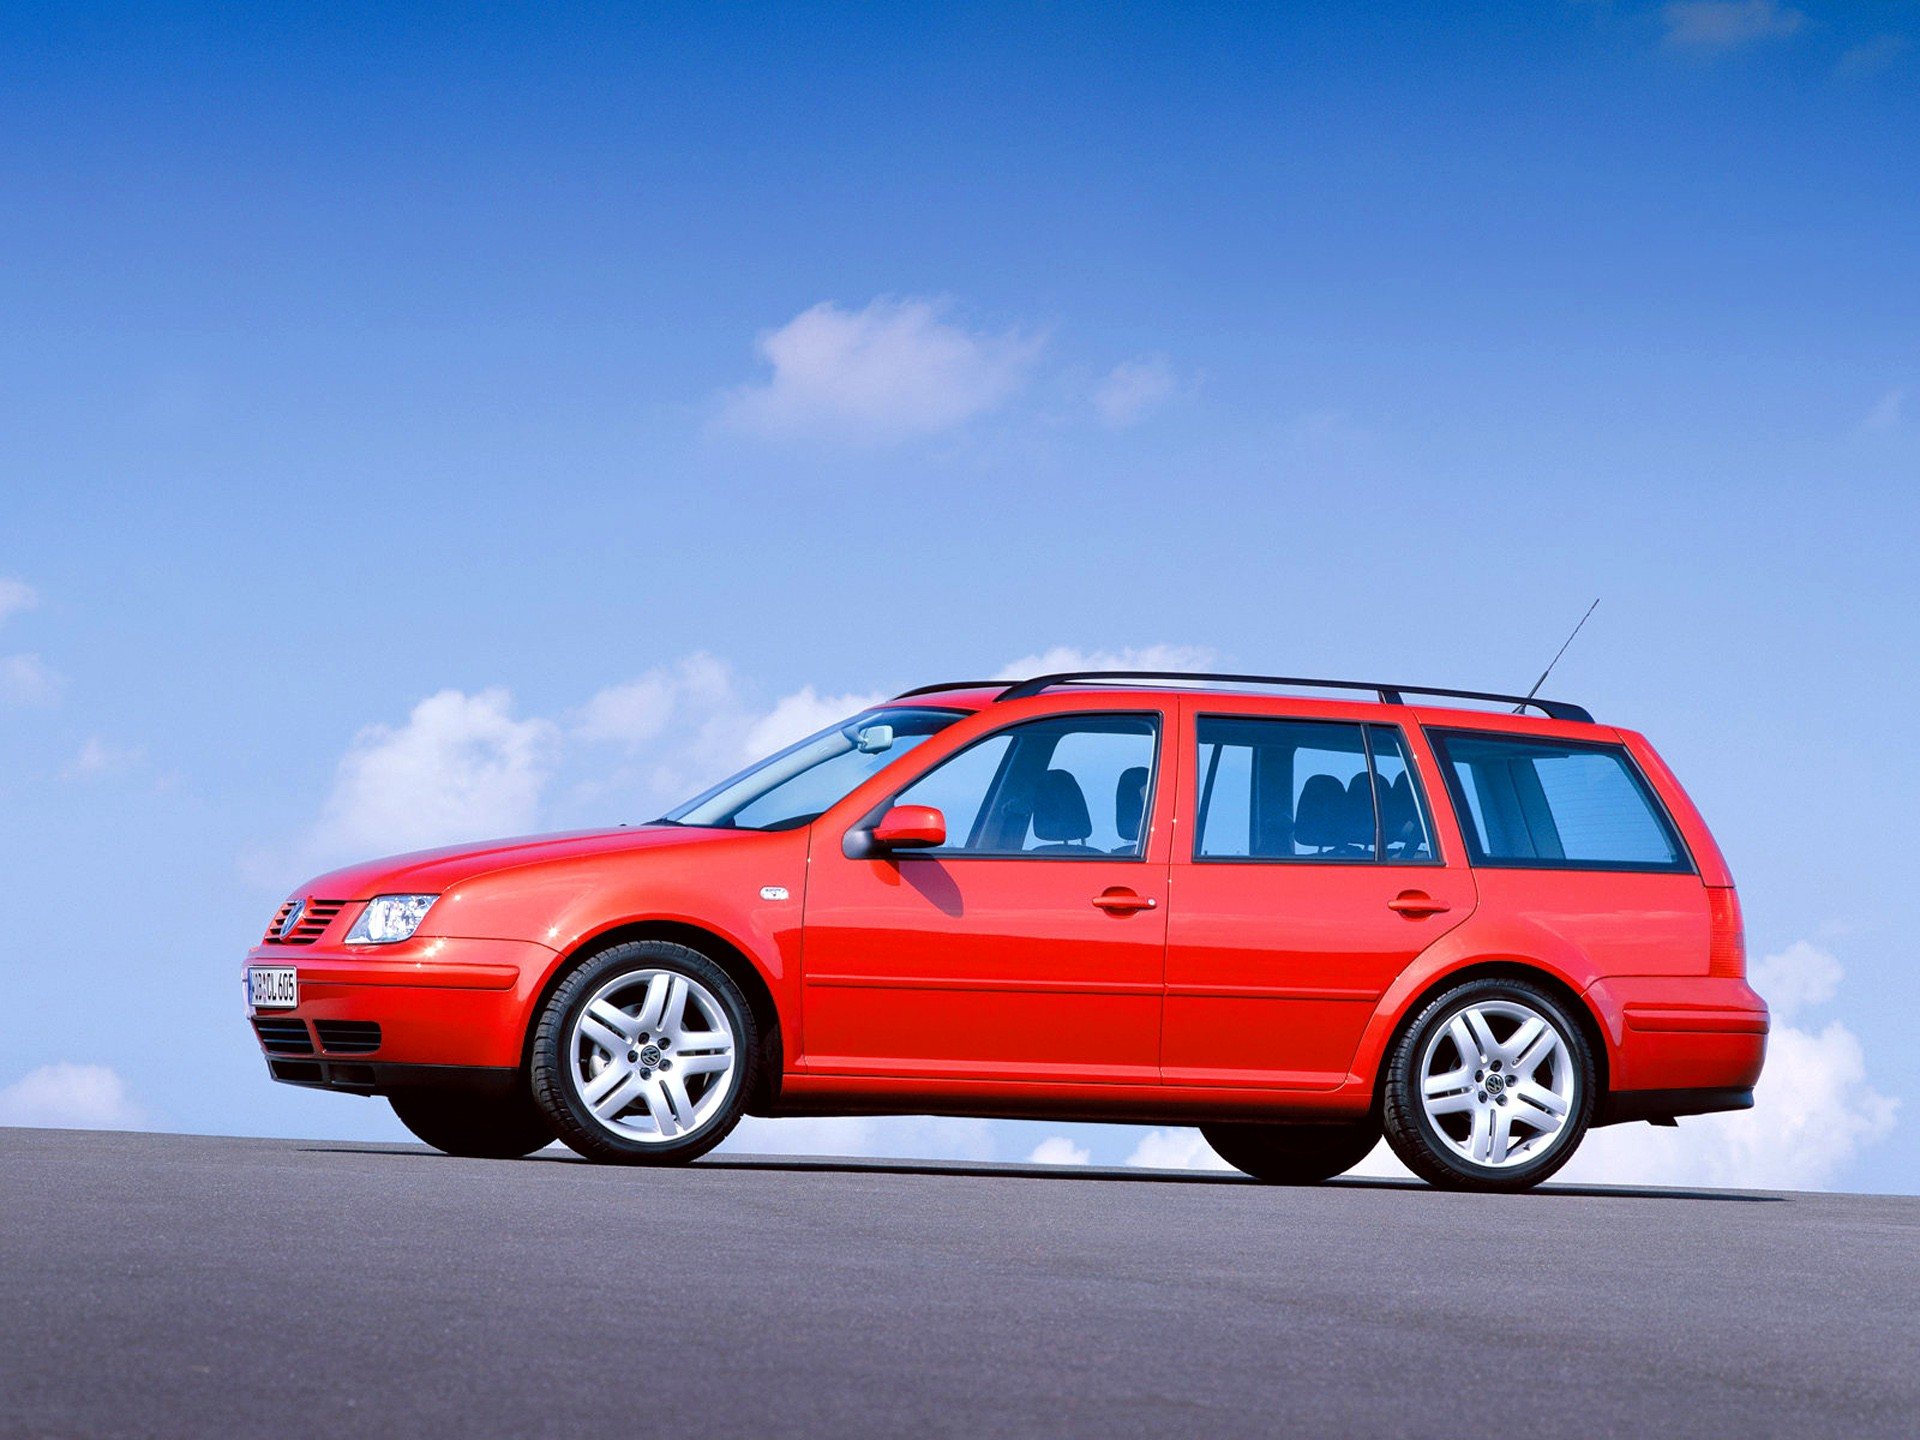 VOLKSWAGEN Bora Variant - 1999, 2000, 2001, 2002, 2003, 2004 - autoevolution